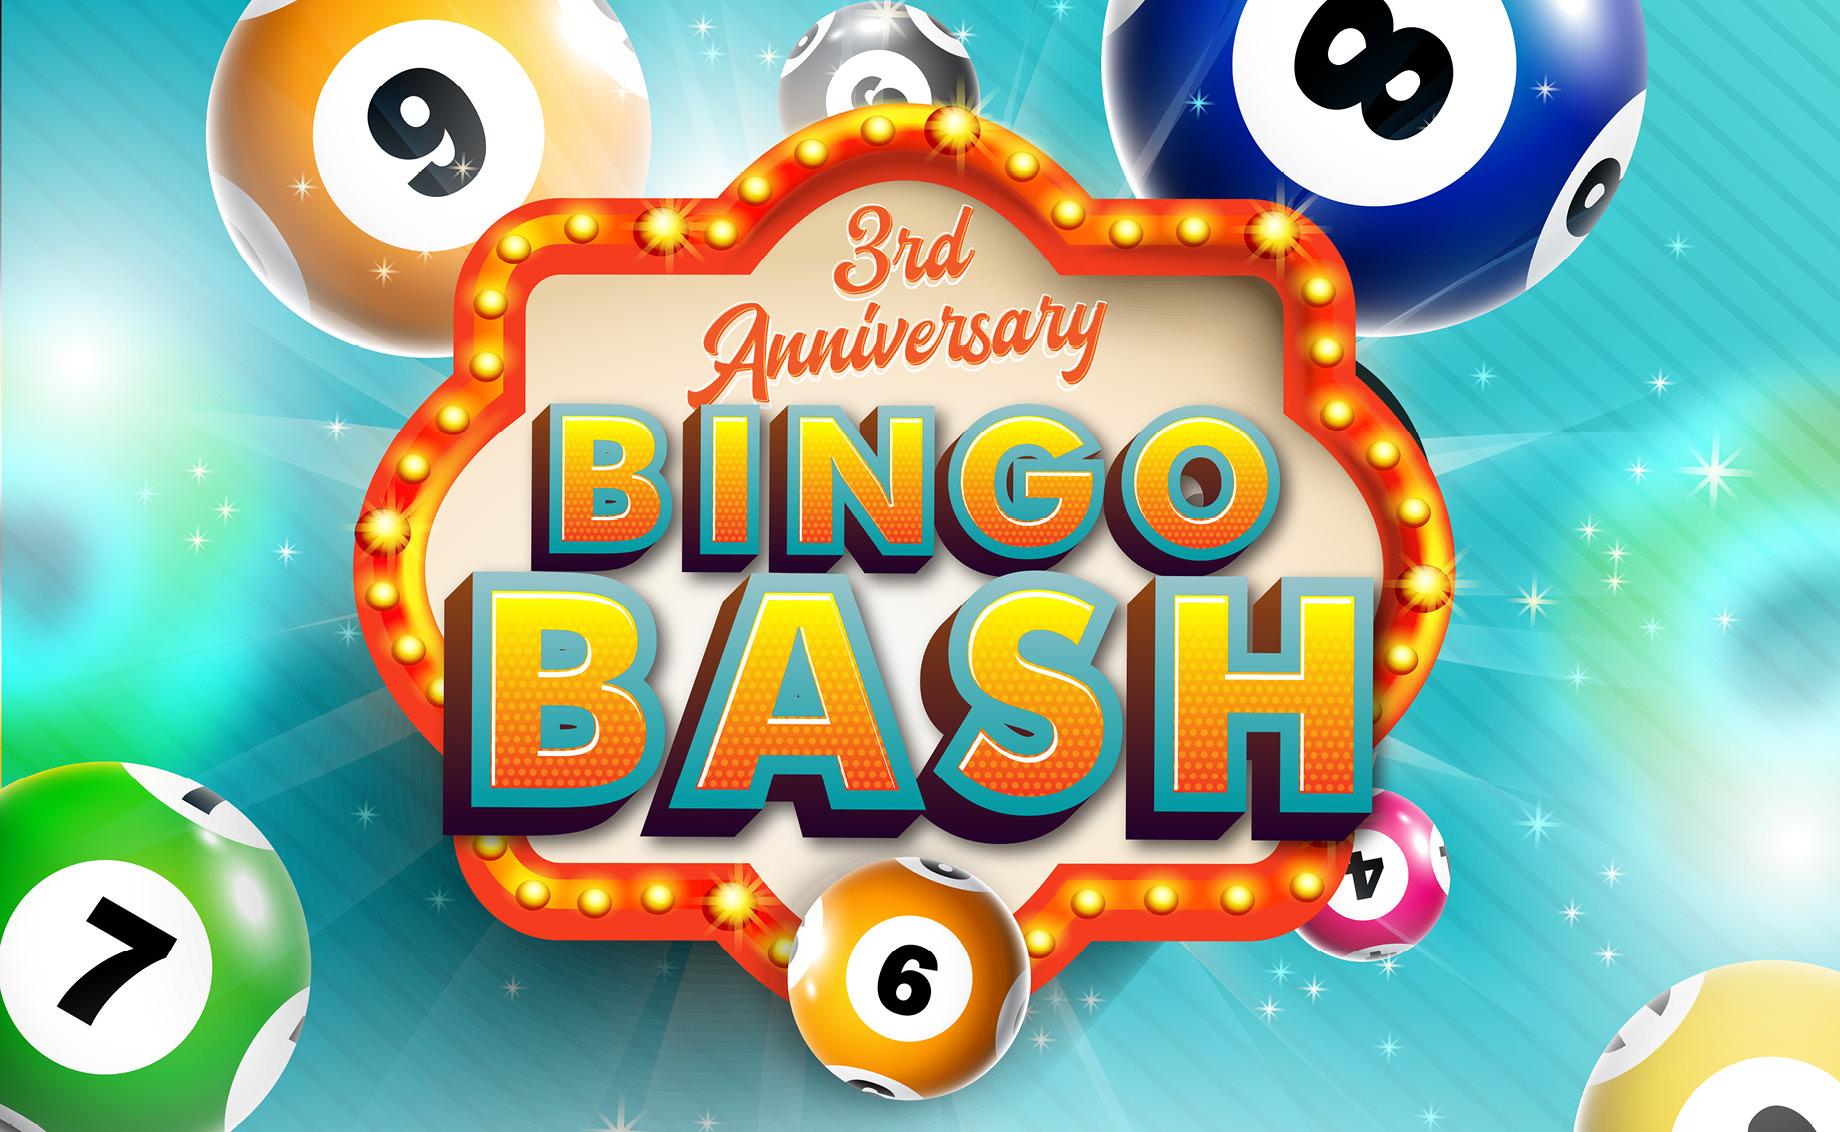 3rd Anniversary Bingo Bash